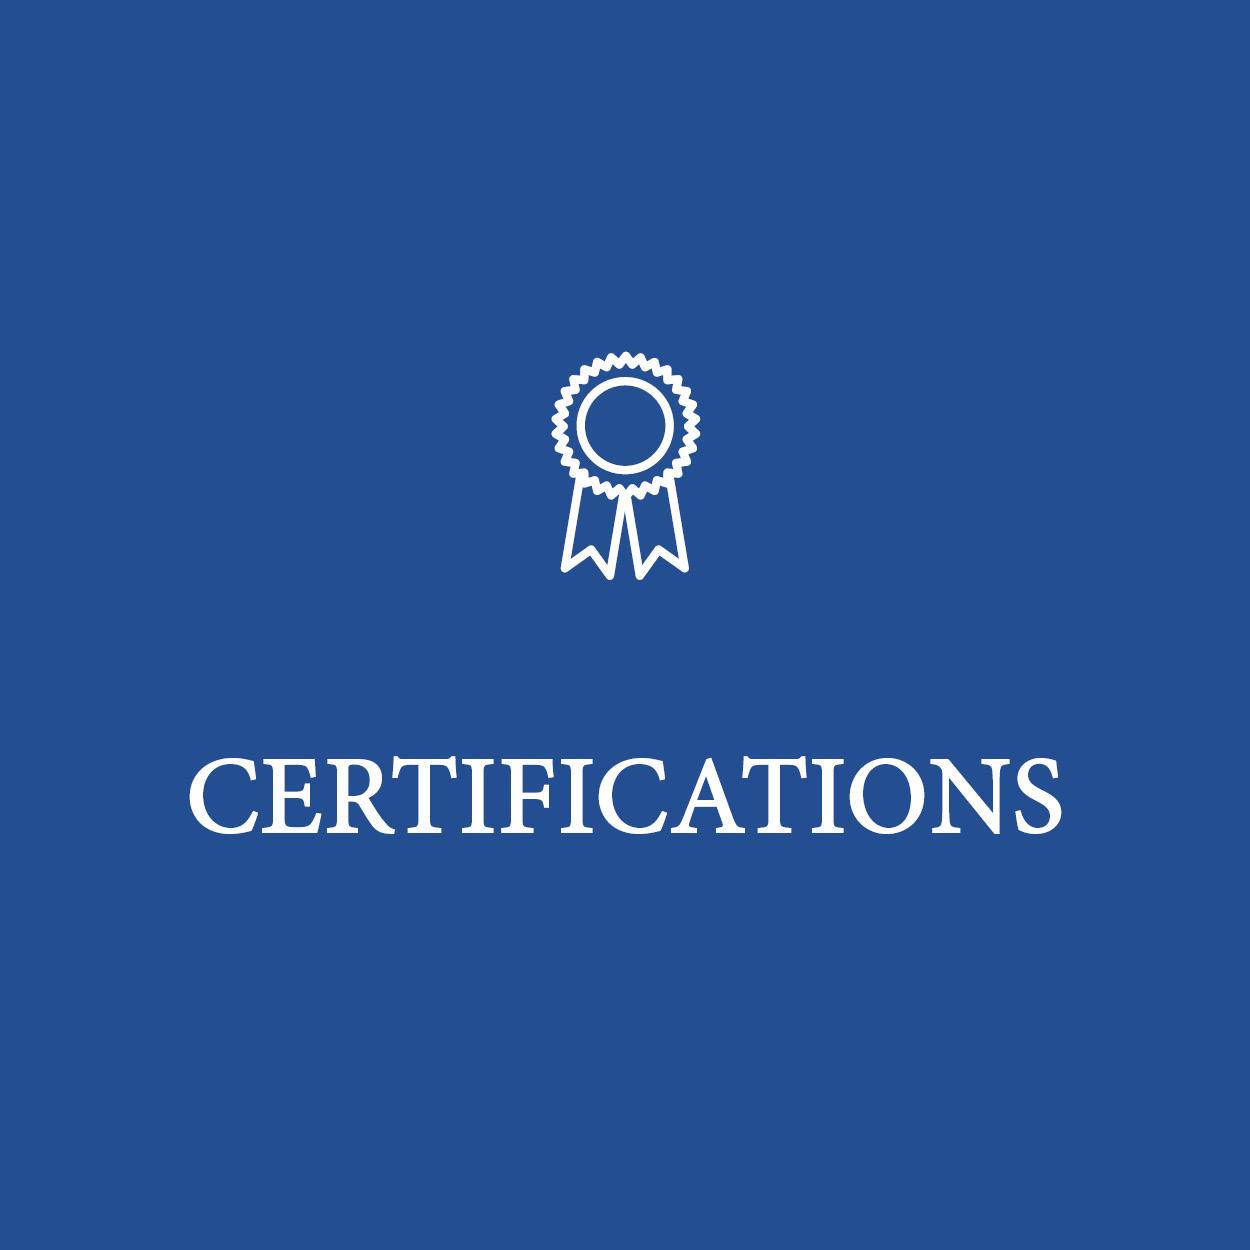 bettershoesfoundation_design_certifications